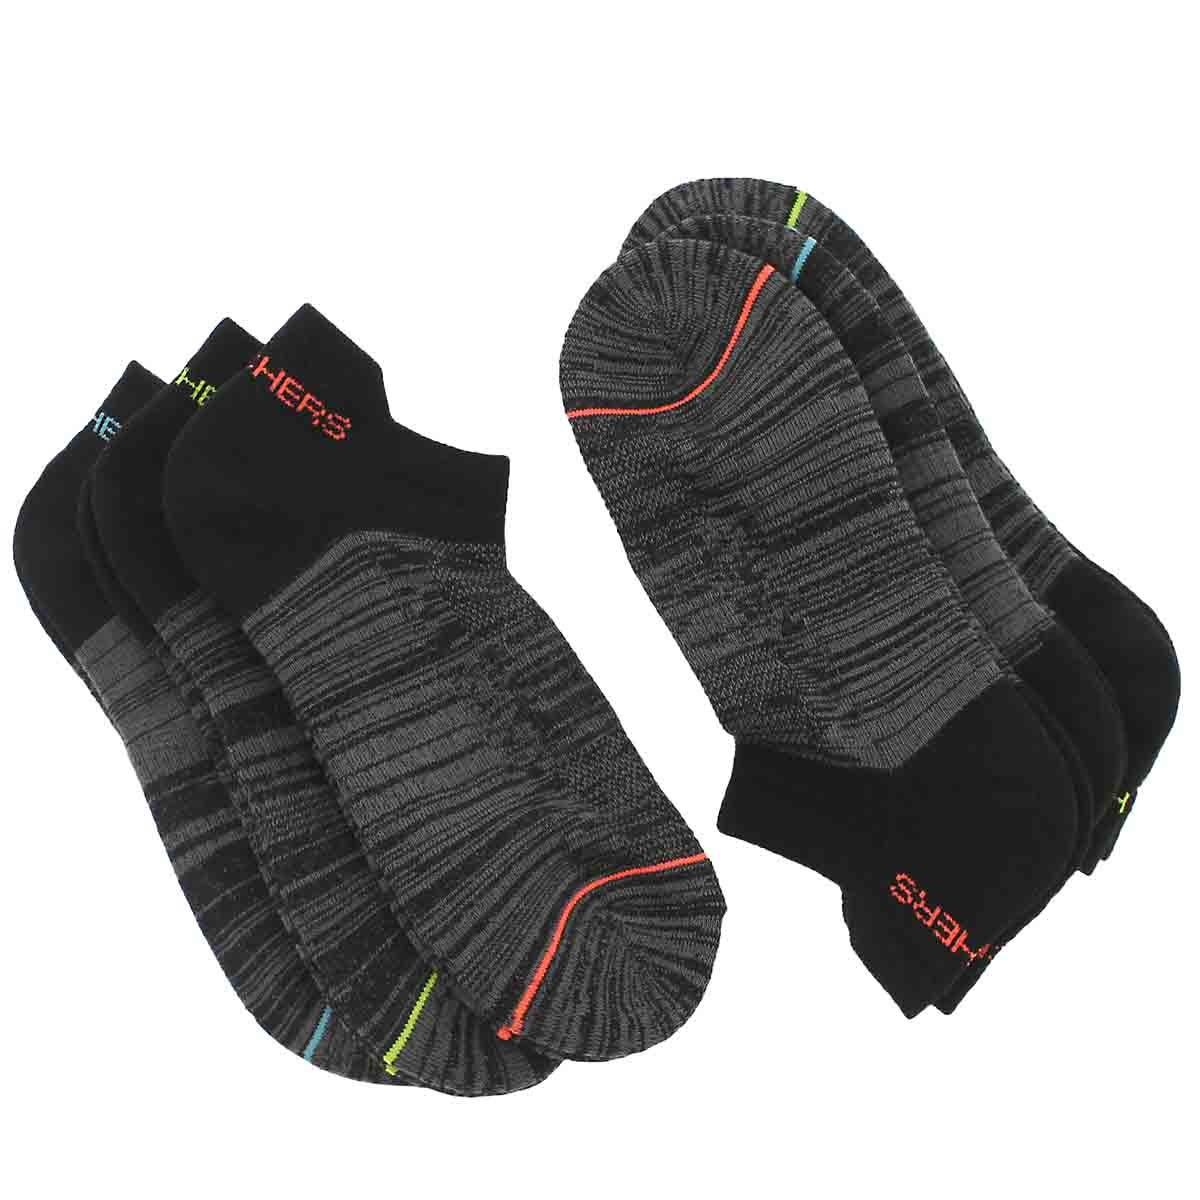 Women's LOW CUT HALF TERRY blk mlti socks 6 pk